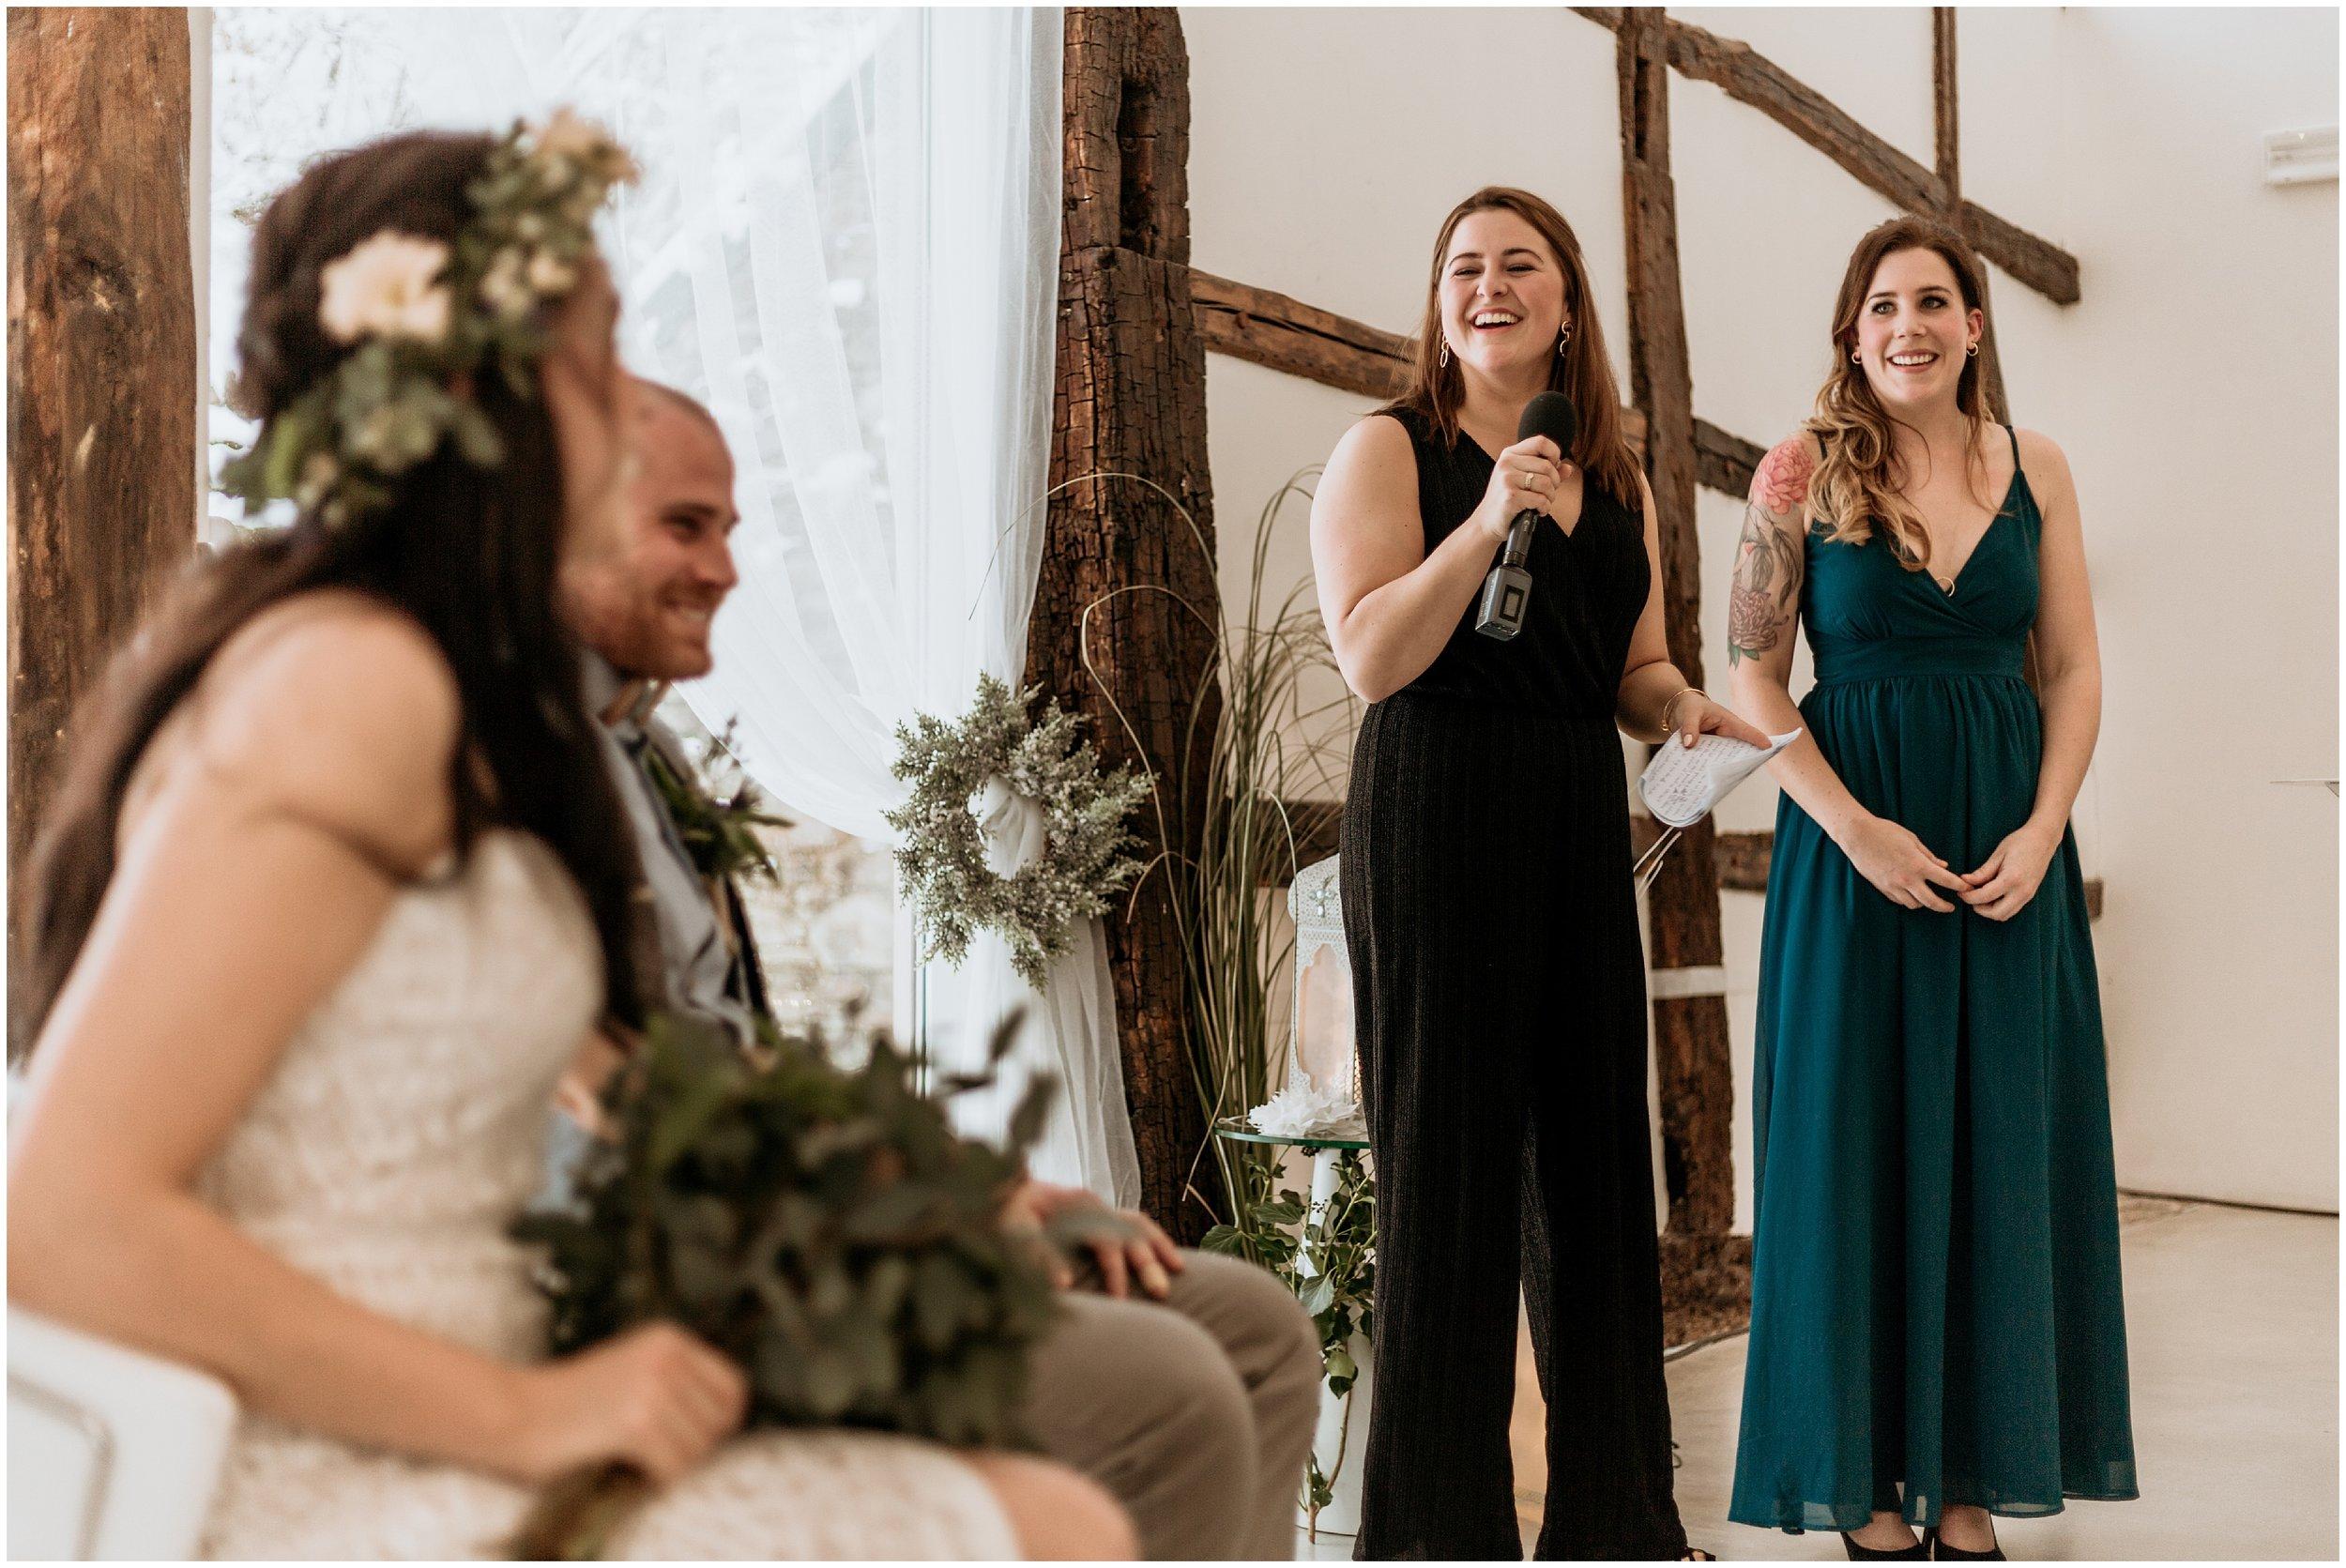 huwelijksfotografie-jana-joeri-ardennen-sechery_0011.jpg